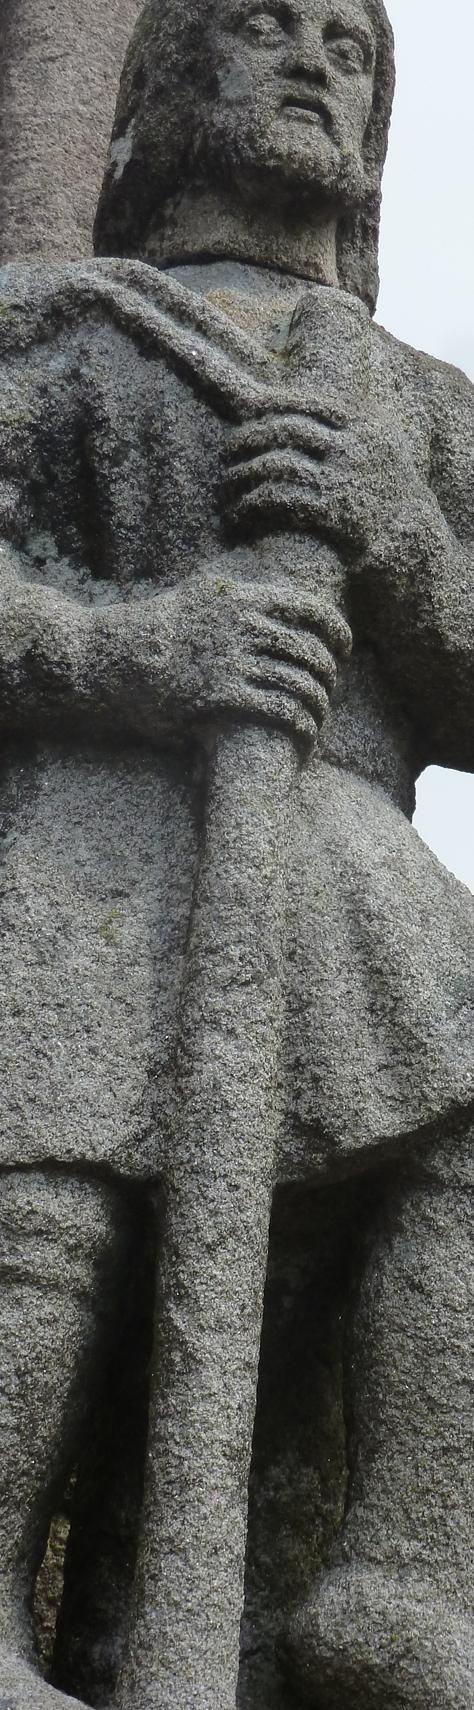 Mai 2012  St Yviec Cahos toul goudic 284pm.jpg